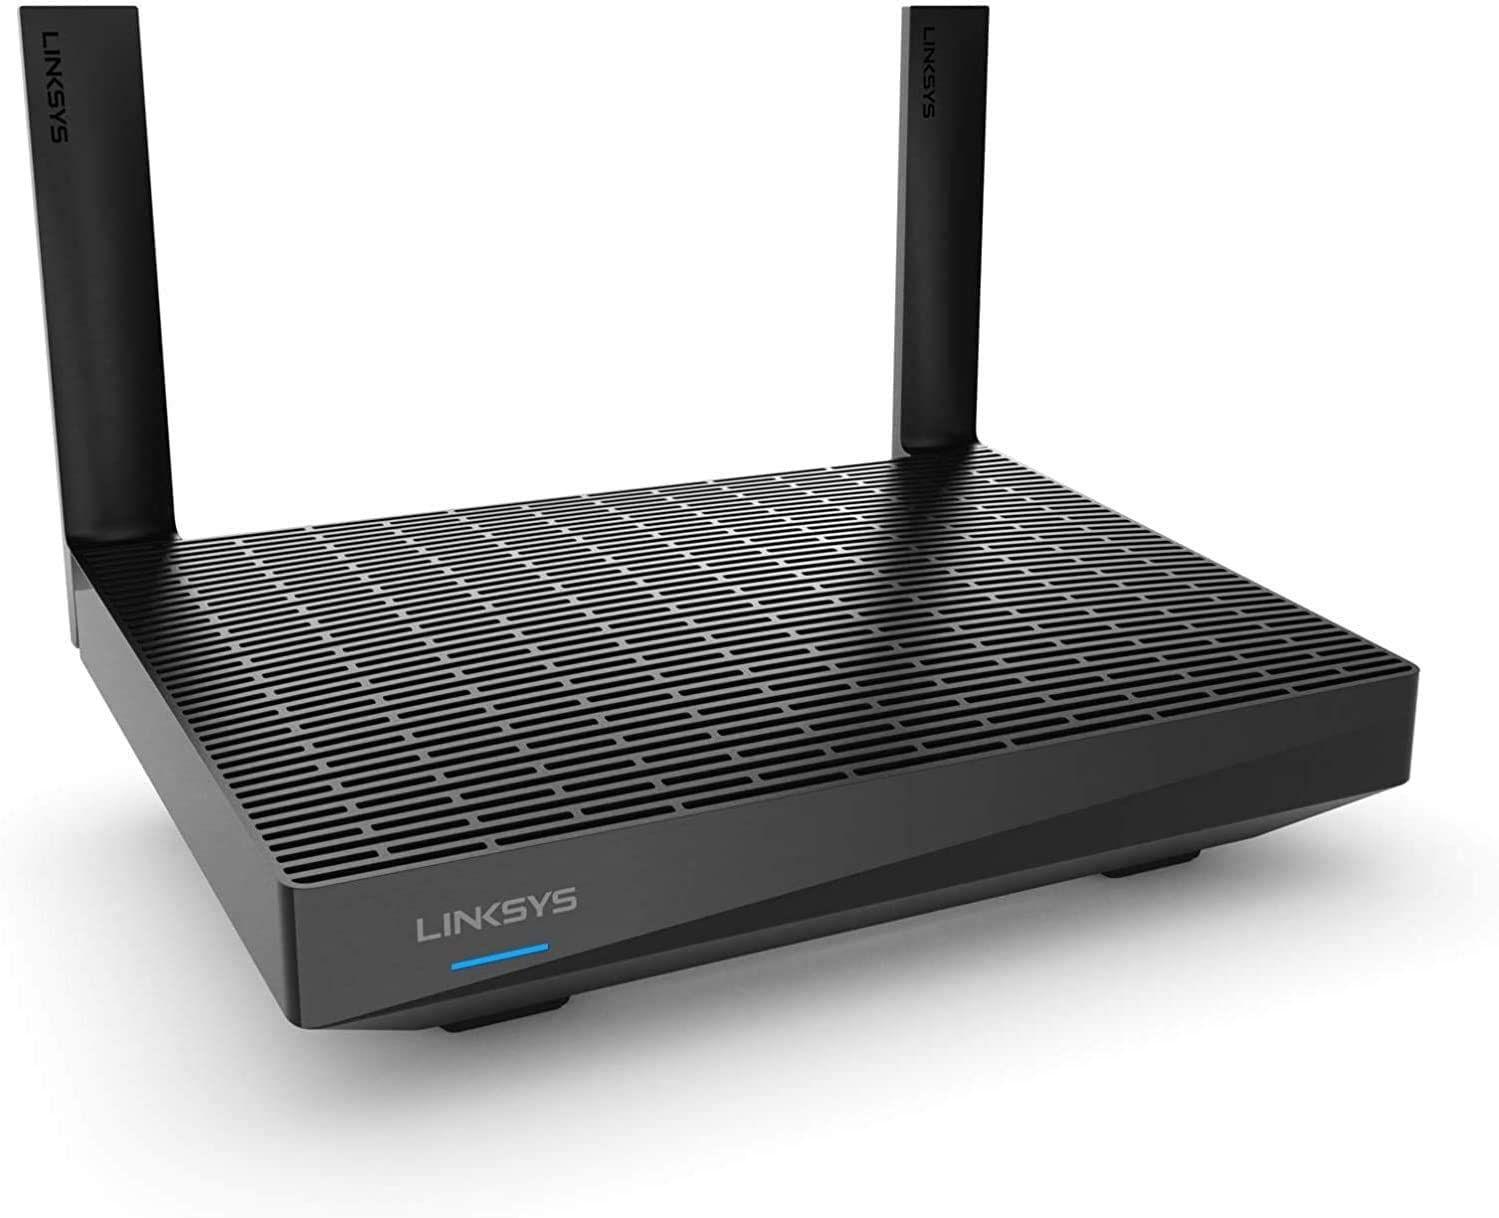 Linksys MR7350 Dual-Band Mesh-WLAN WiFi 6-Router (AX1800, bis 150 m², 1,8 Gbit/s, Velop WLAN-System, Kinderschutzfunktionen per Linksys App)